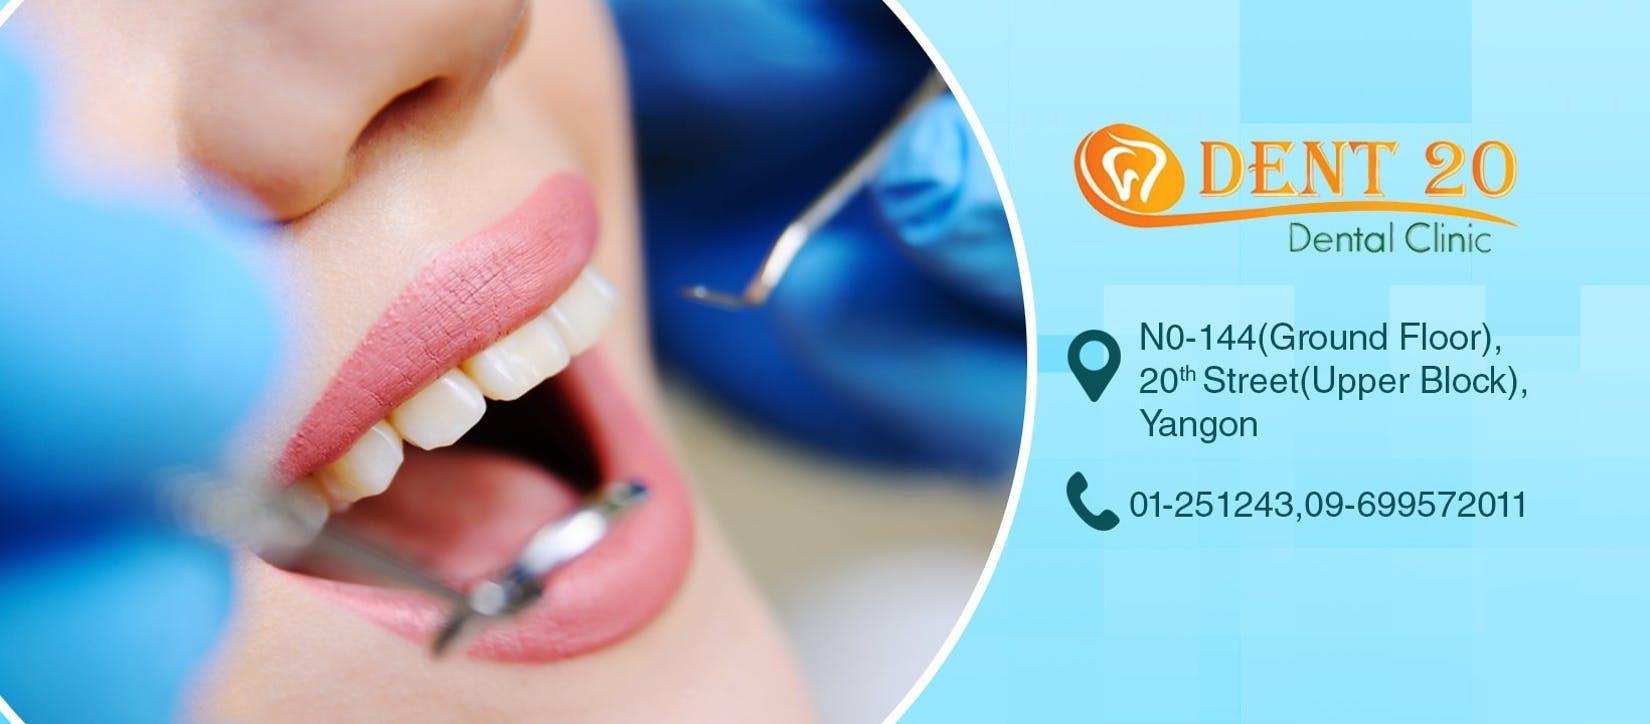 Dent 20 Dental Clinic   Medical